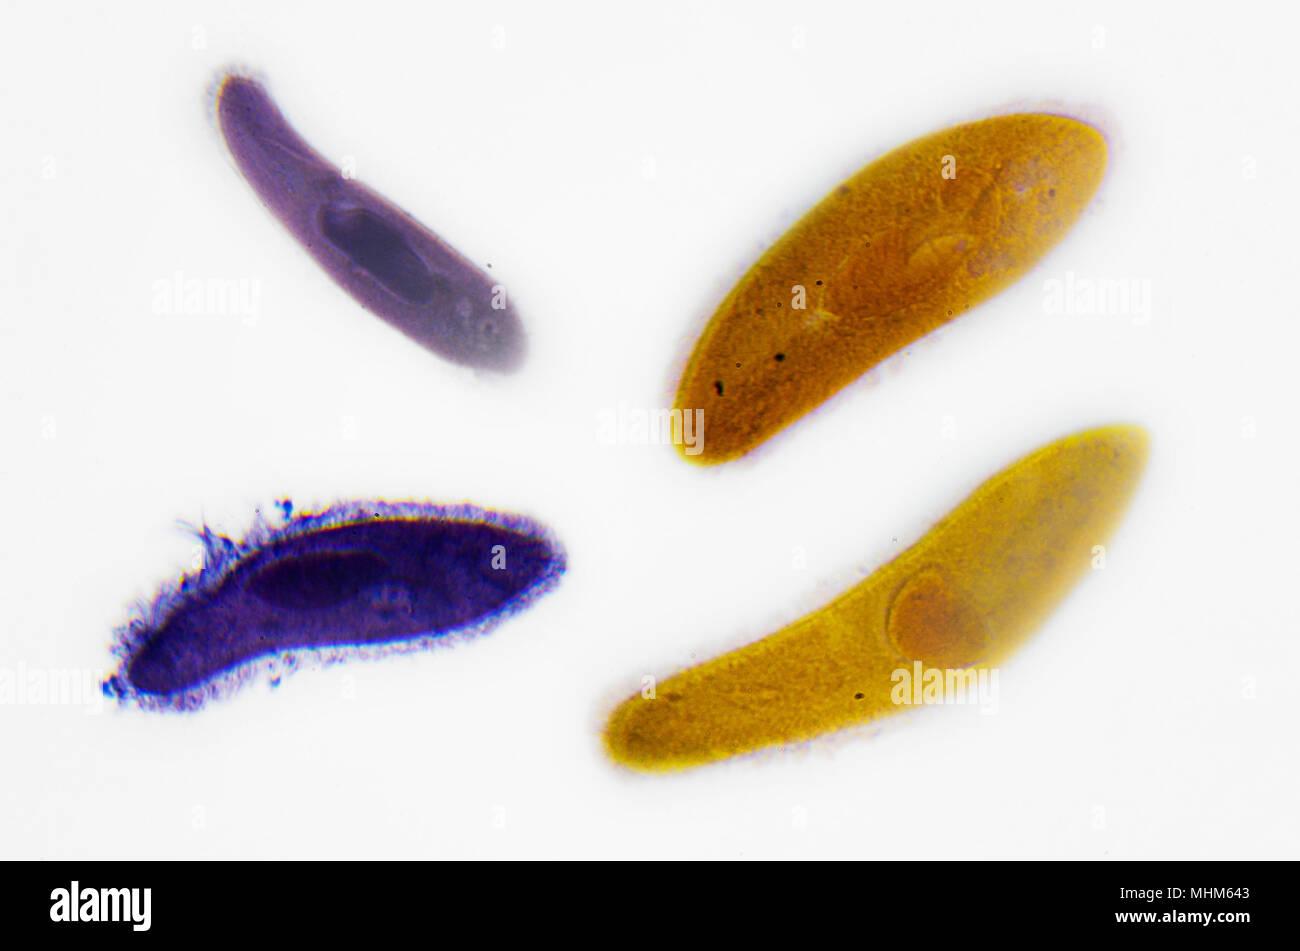 Microscopy Photography. Paramecium. - Stock Image